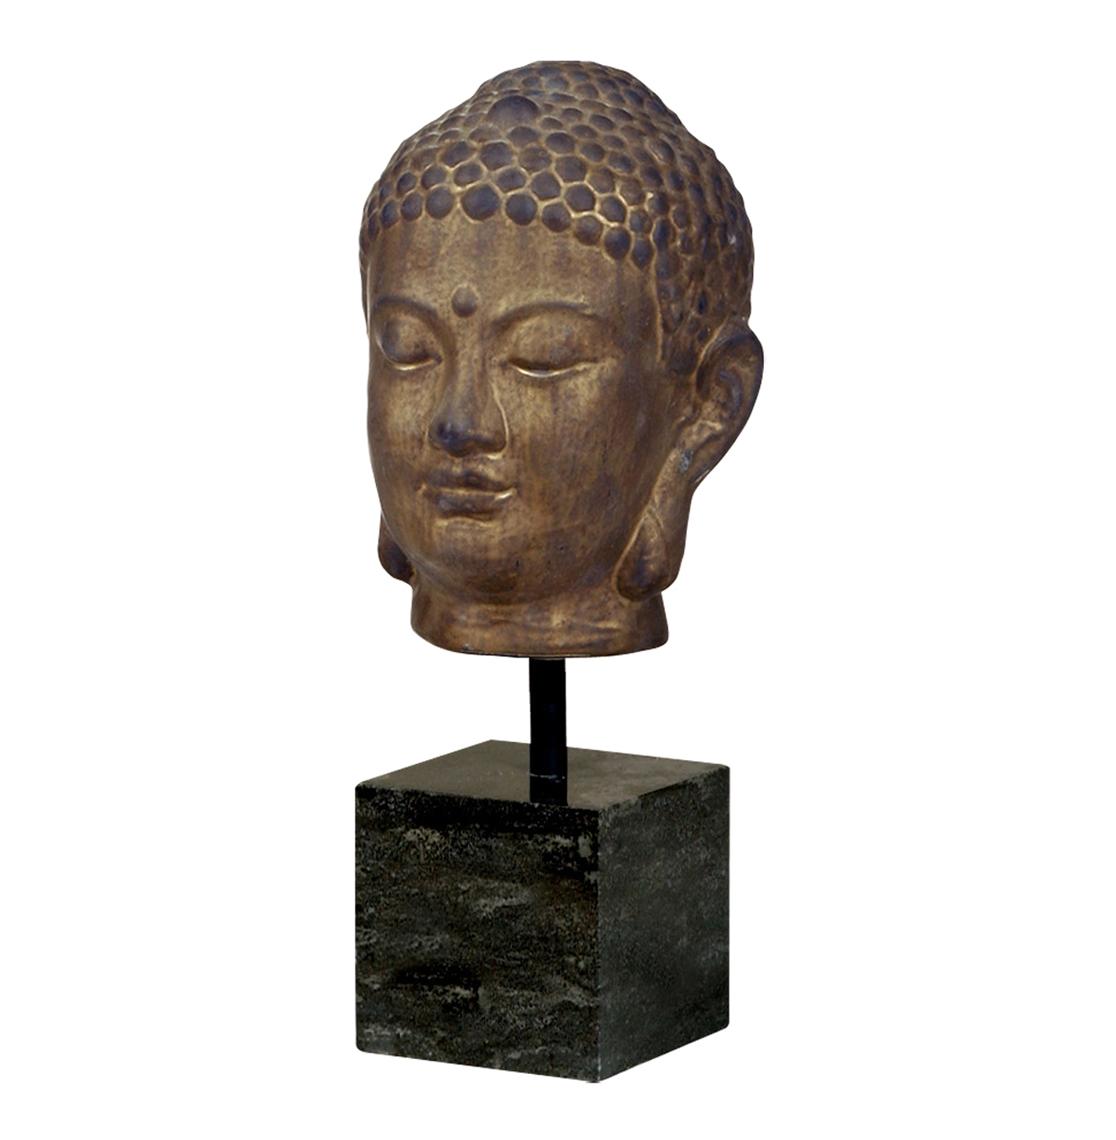 Large Bronze Buddha Head Sculpture on Marble Base